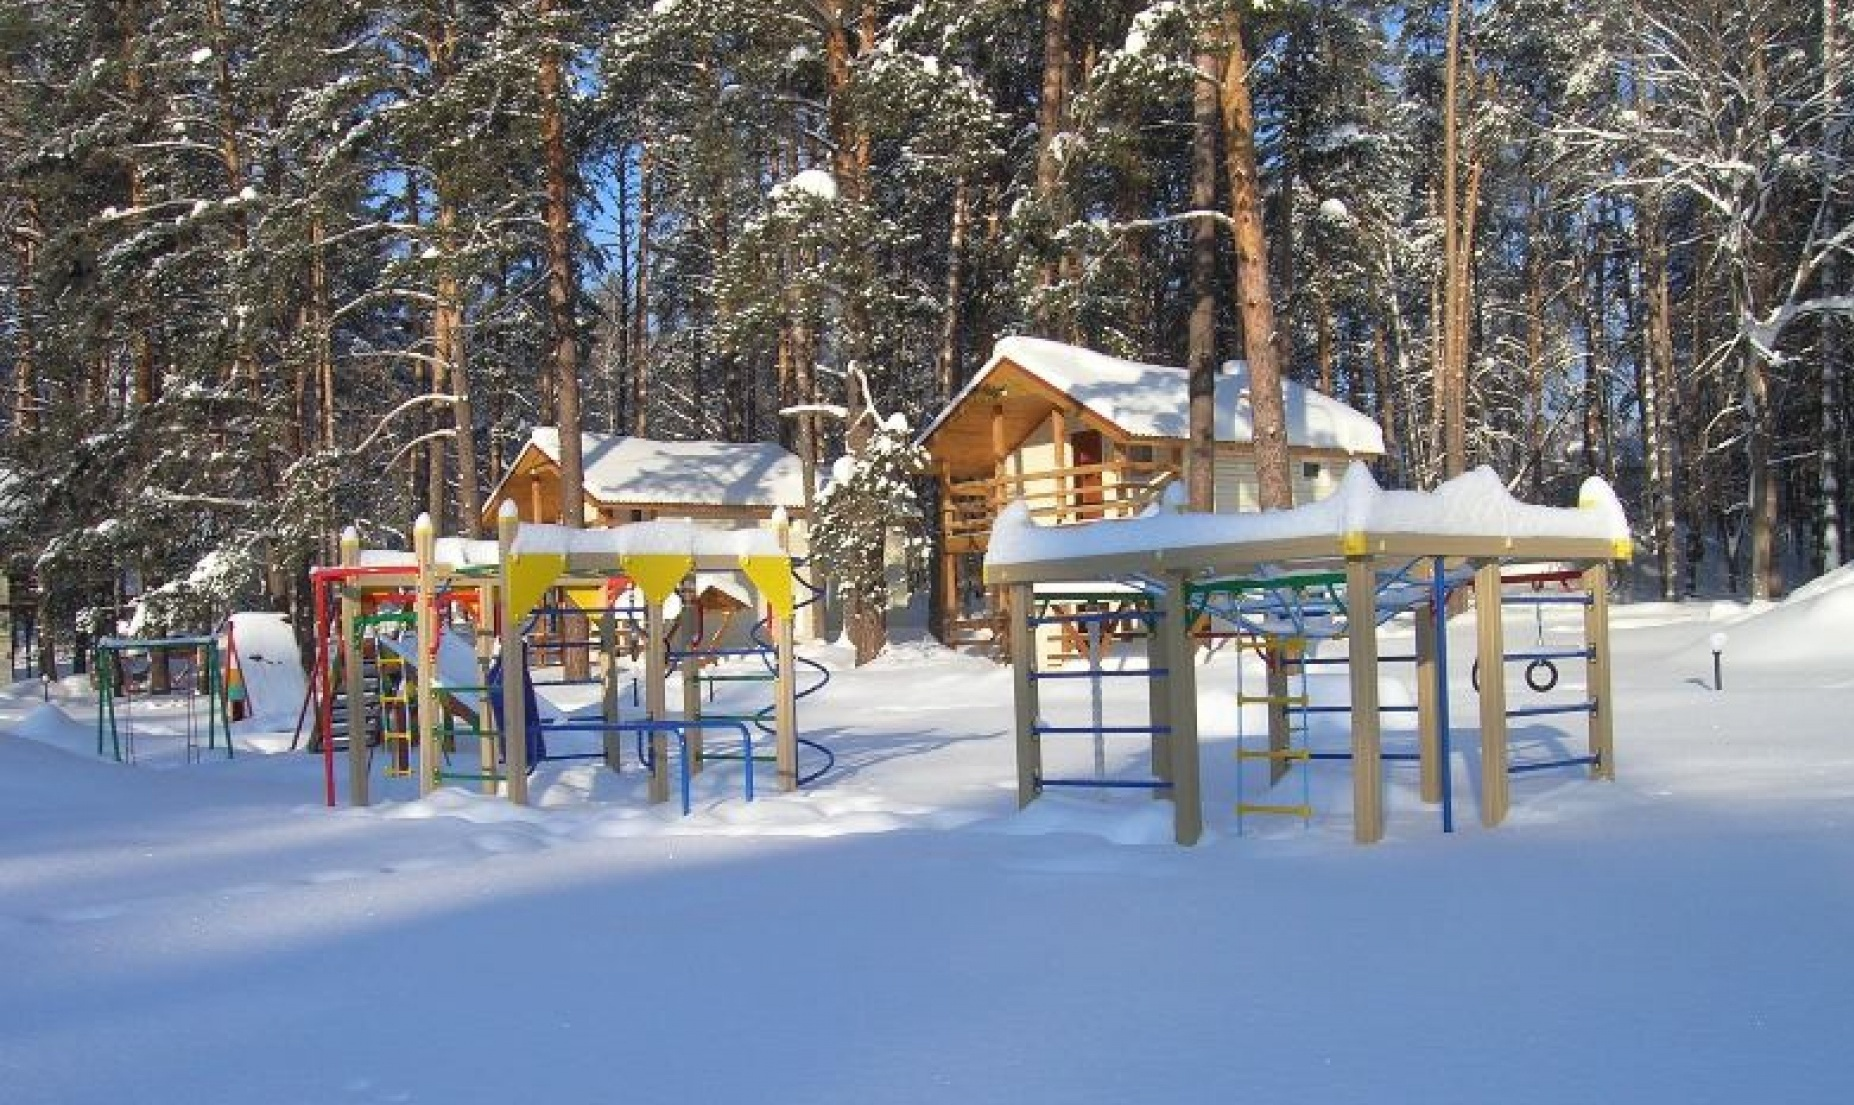 База отдыха «Лебяжье» Республика Татарстан, фото 14